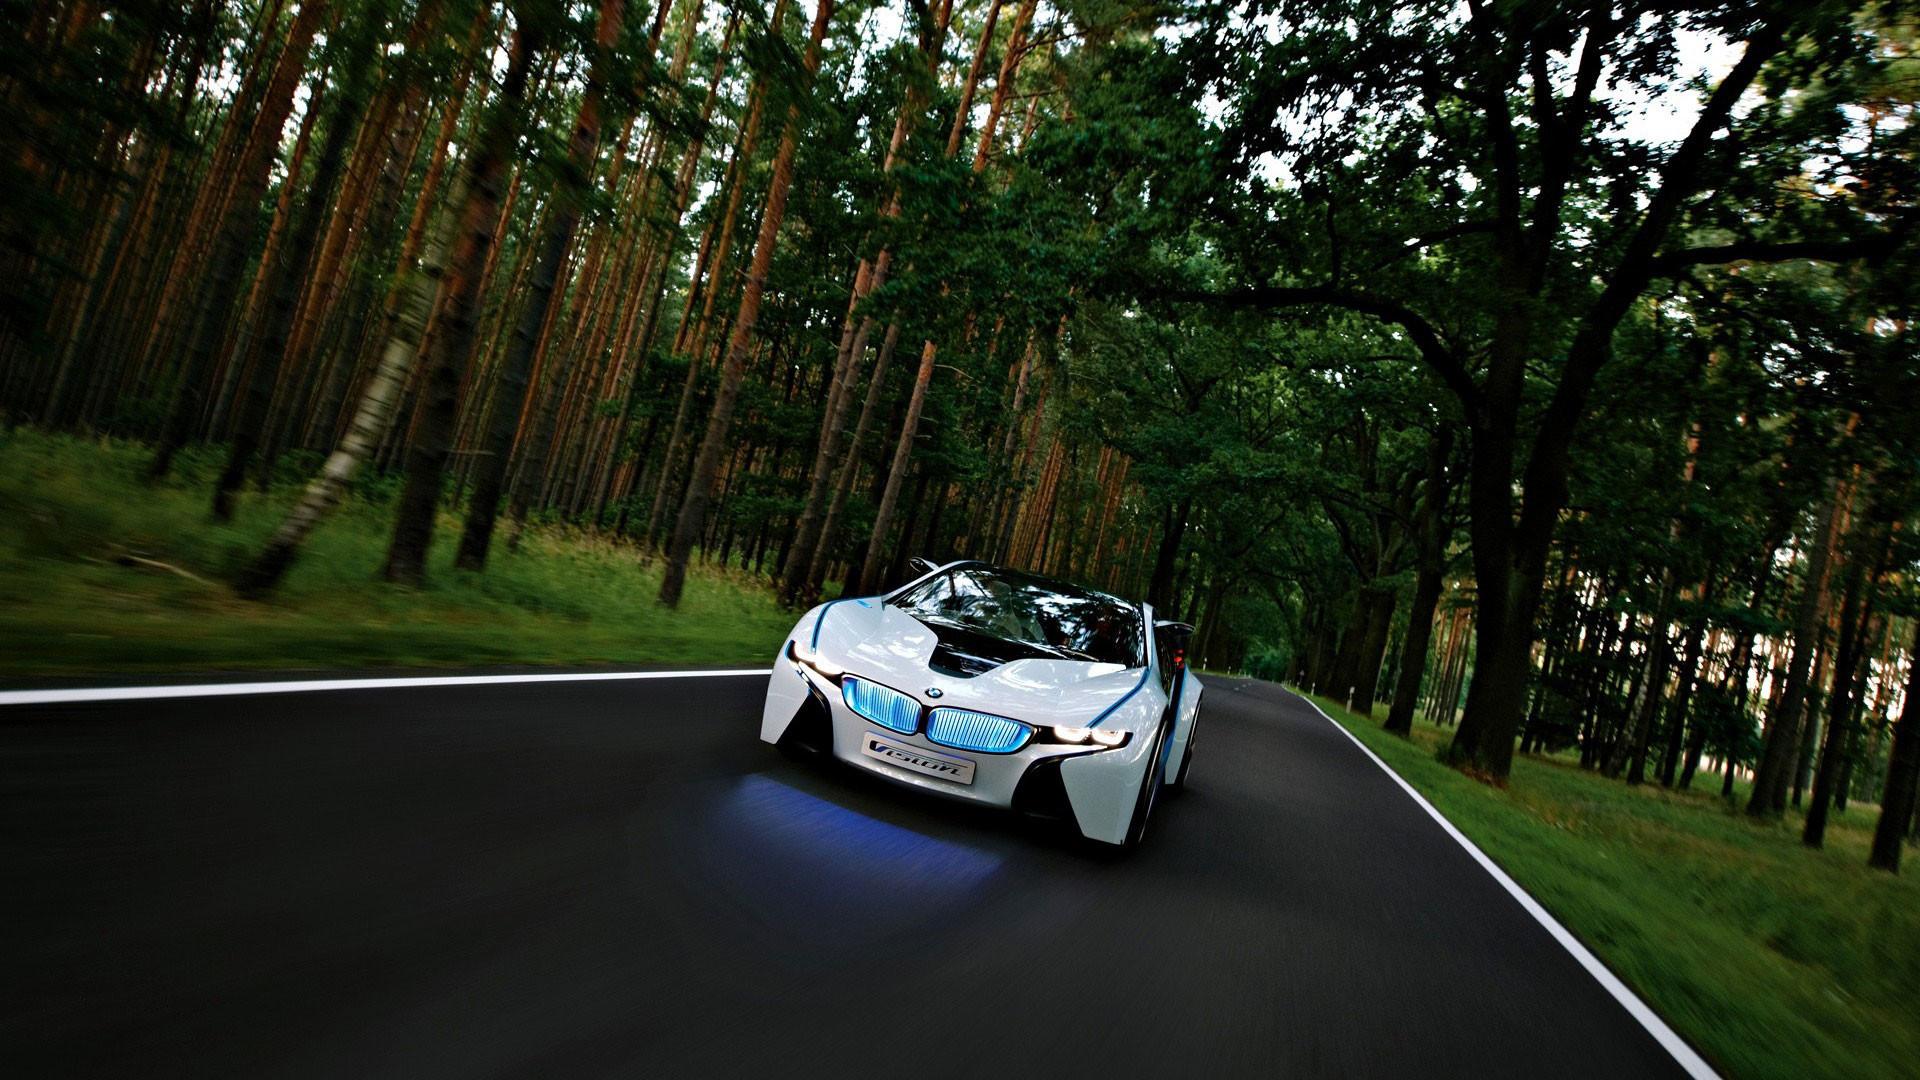 hd pics photos cars ride nice desktop background wallpaper